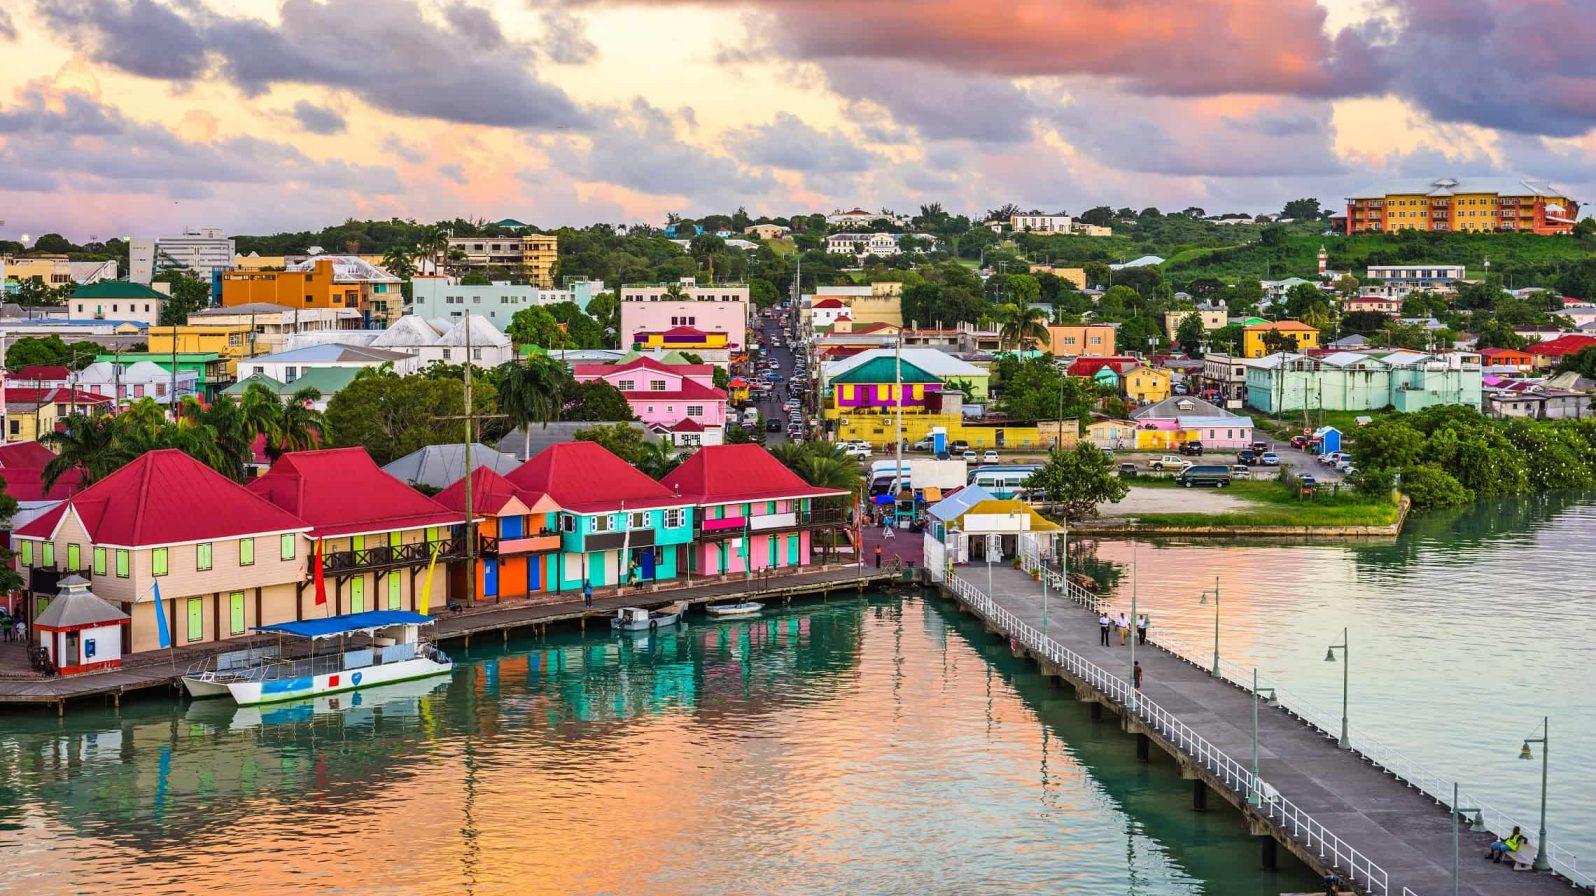 St.-Johns-Antigua-Karibia-1596x896.jpeg